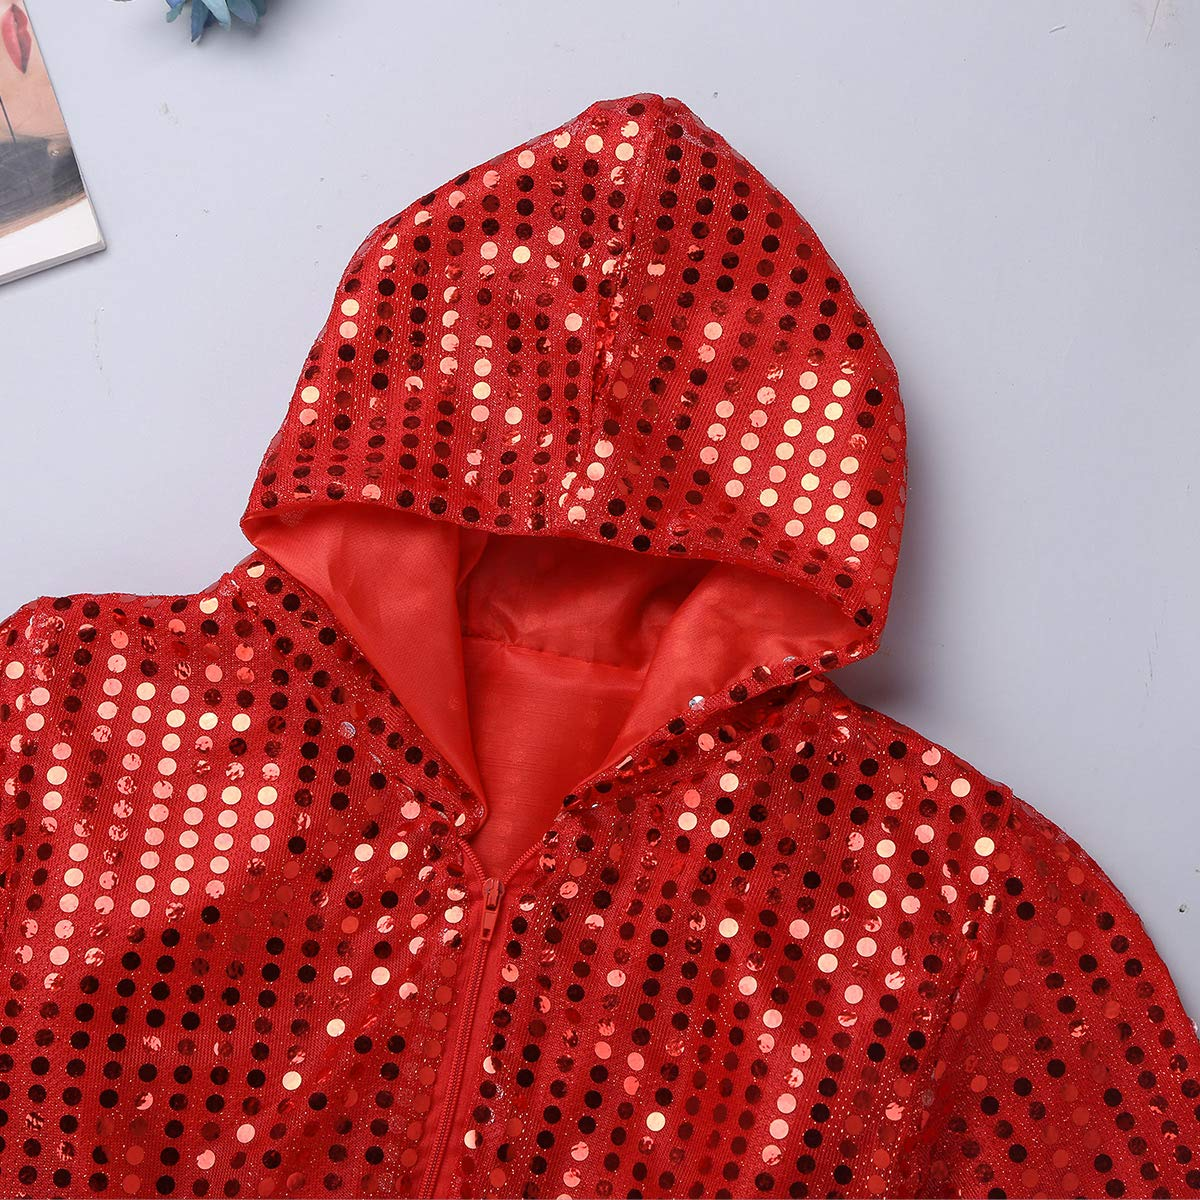 Great Pretenders Dress Up Pink Fairy Tunic /& Cape Bundle Dress up Costume Size 3-4 CREKN 98003